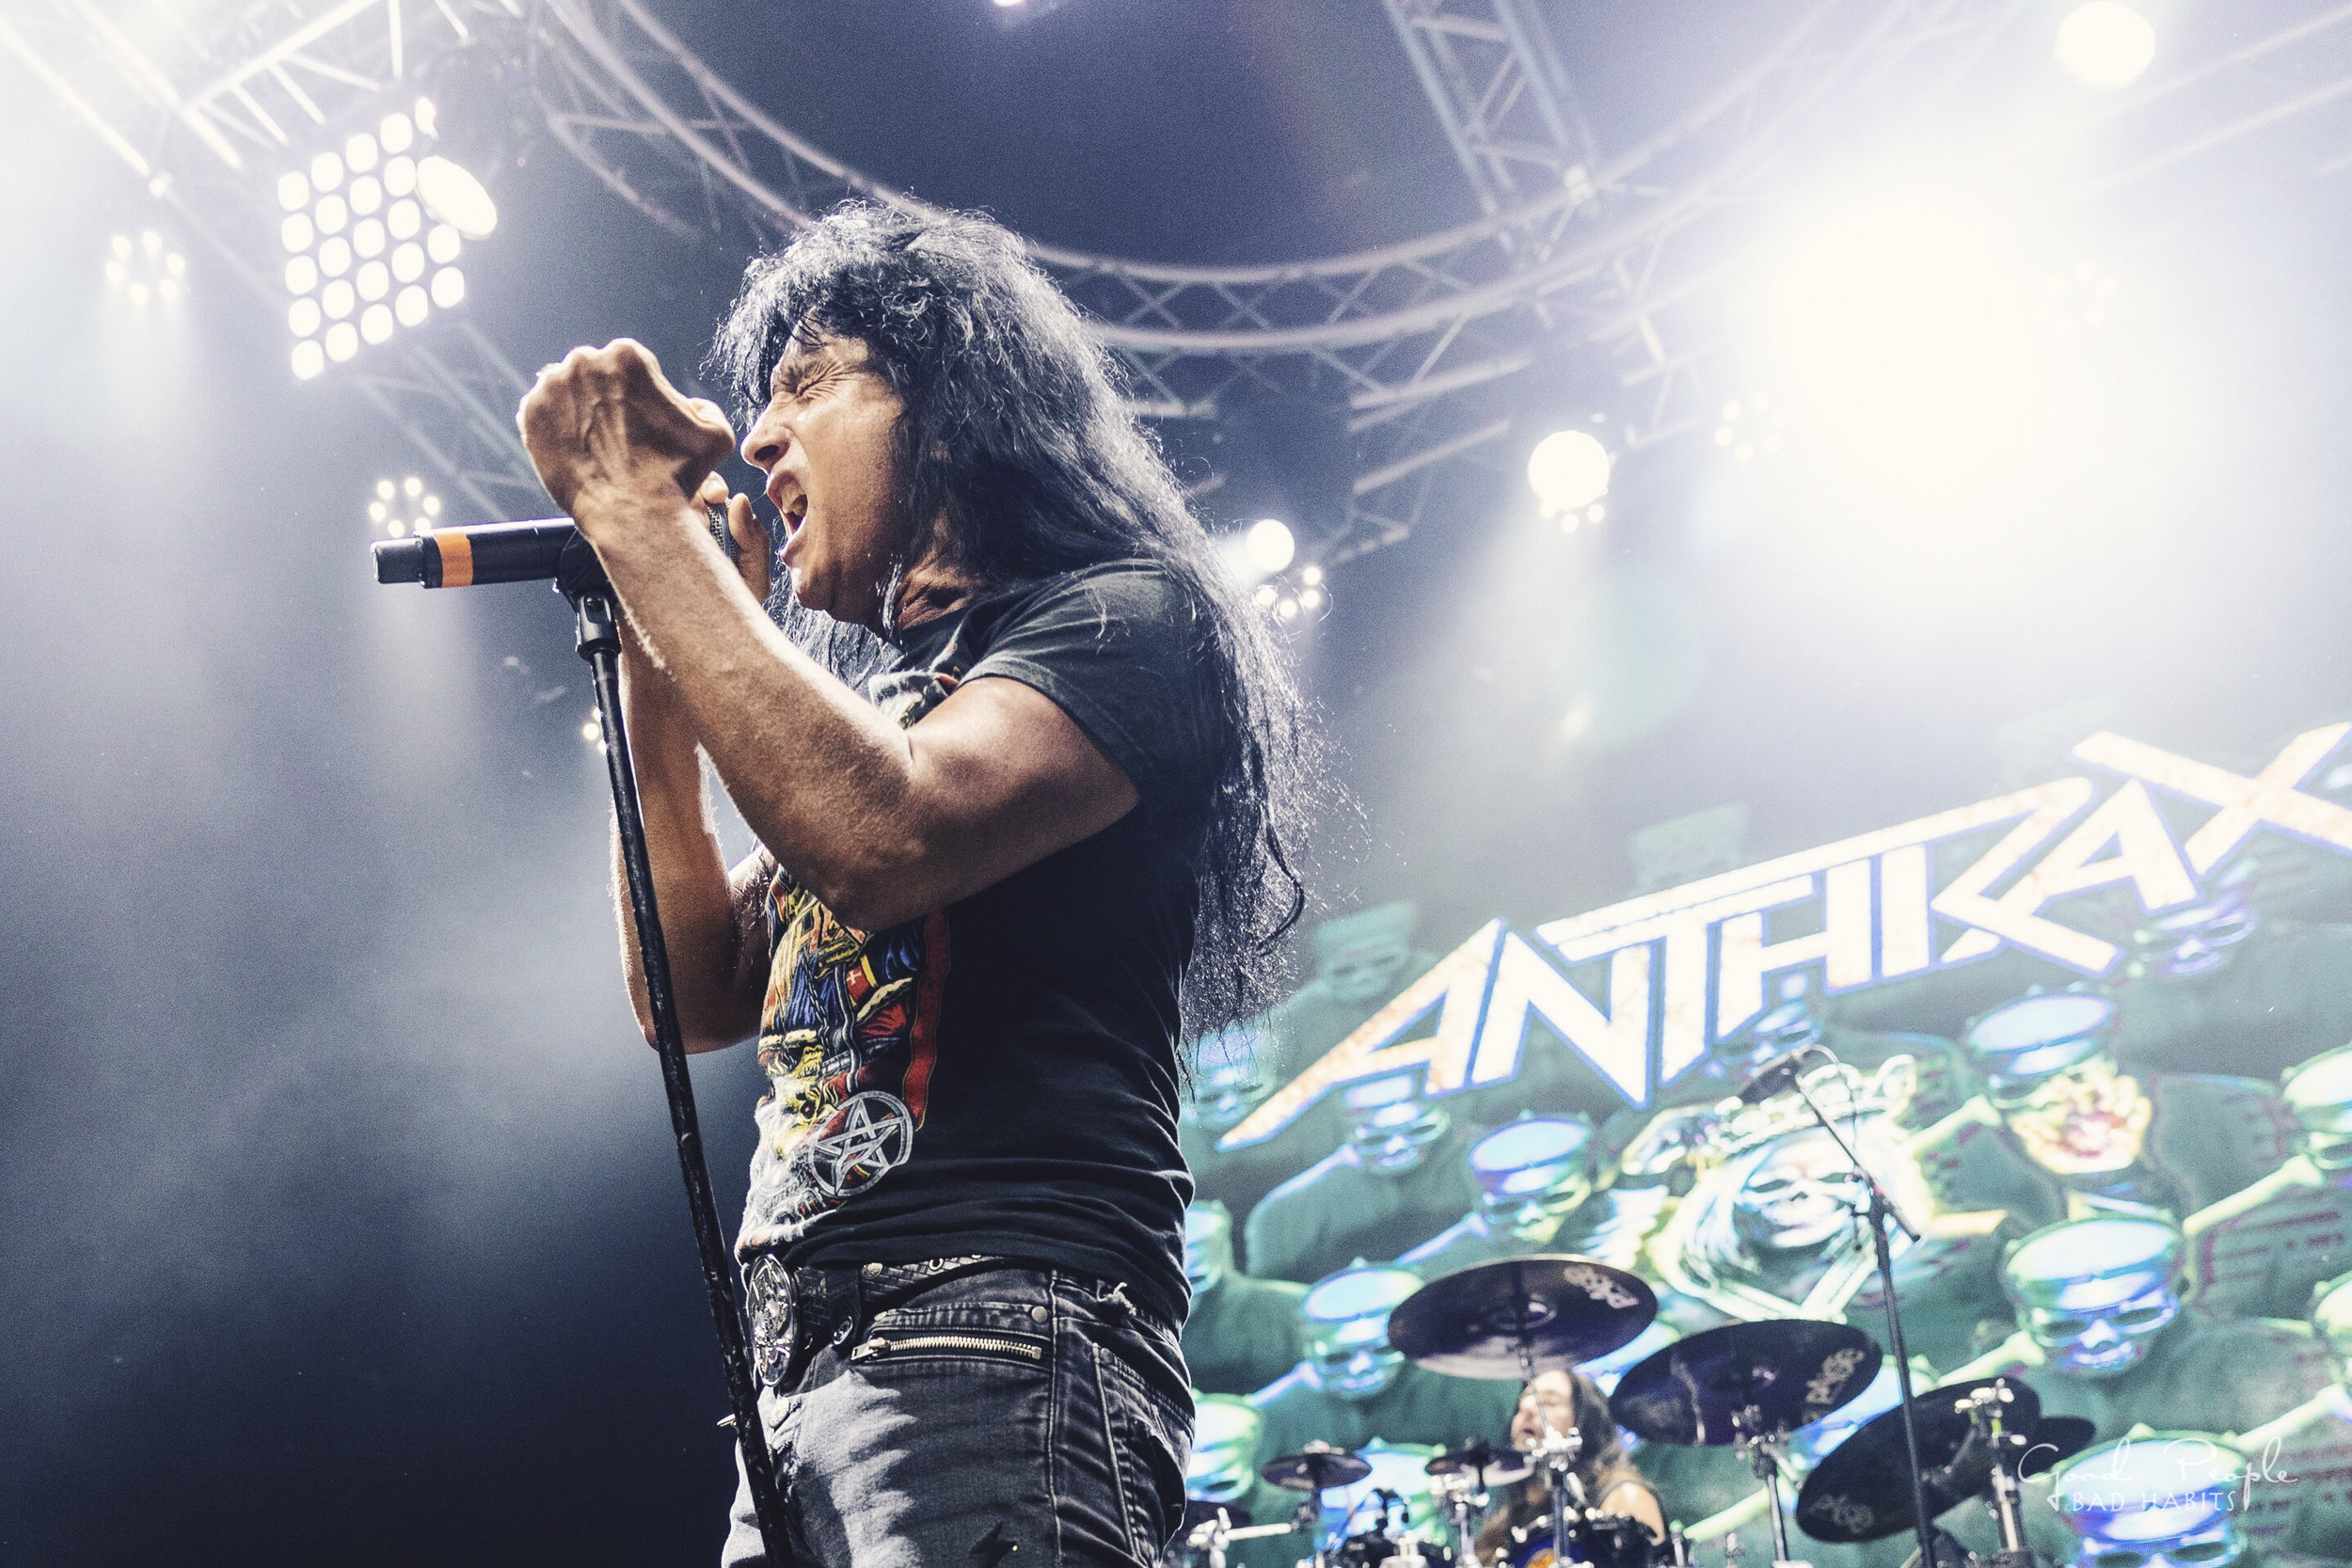 Anthrax_01.jpg